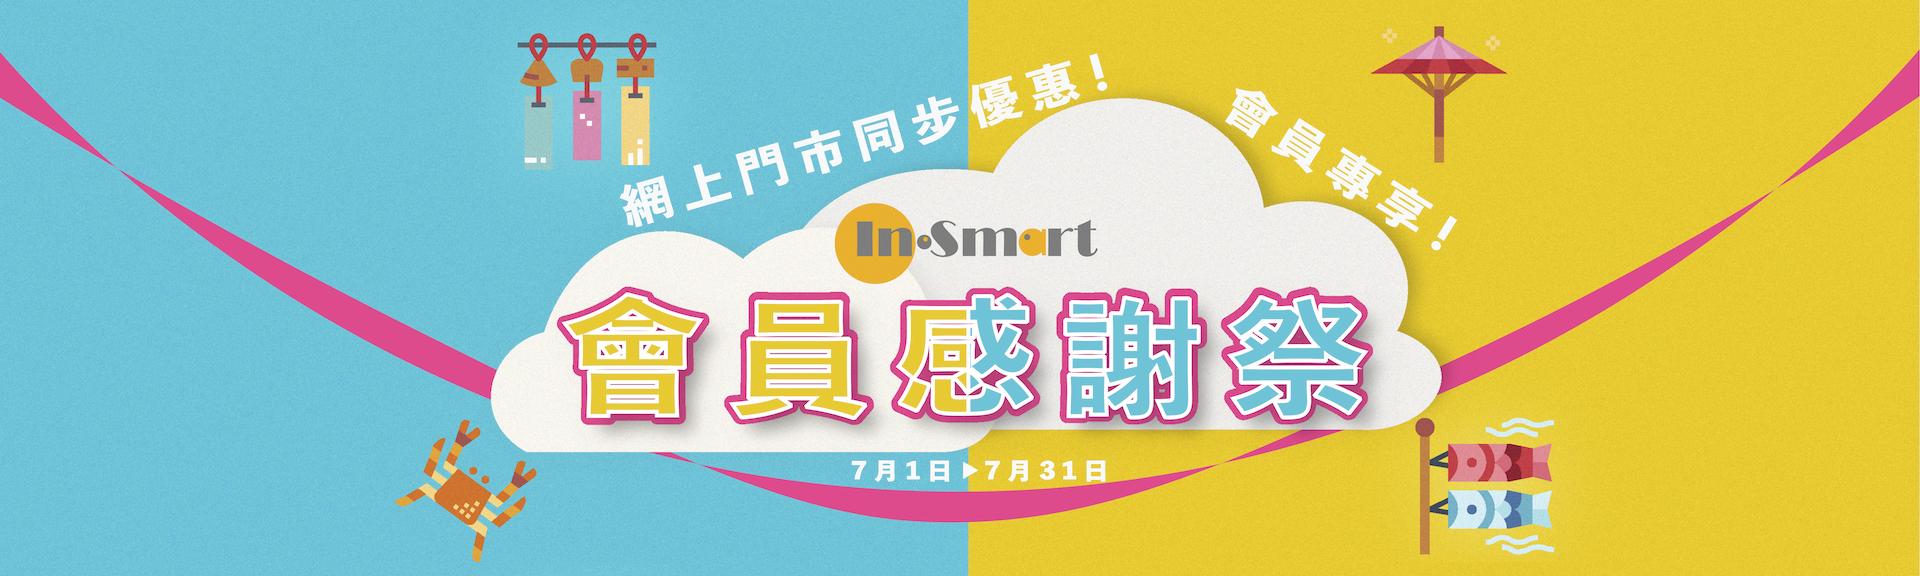 In-Smart 會員應謝z祭